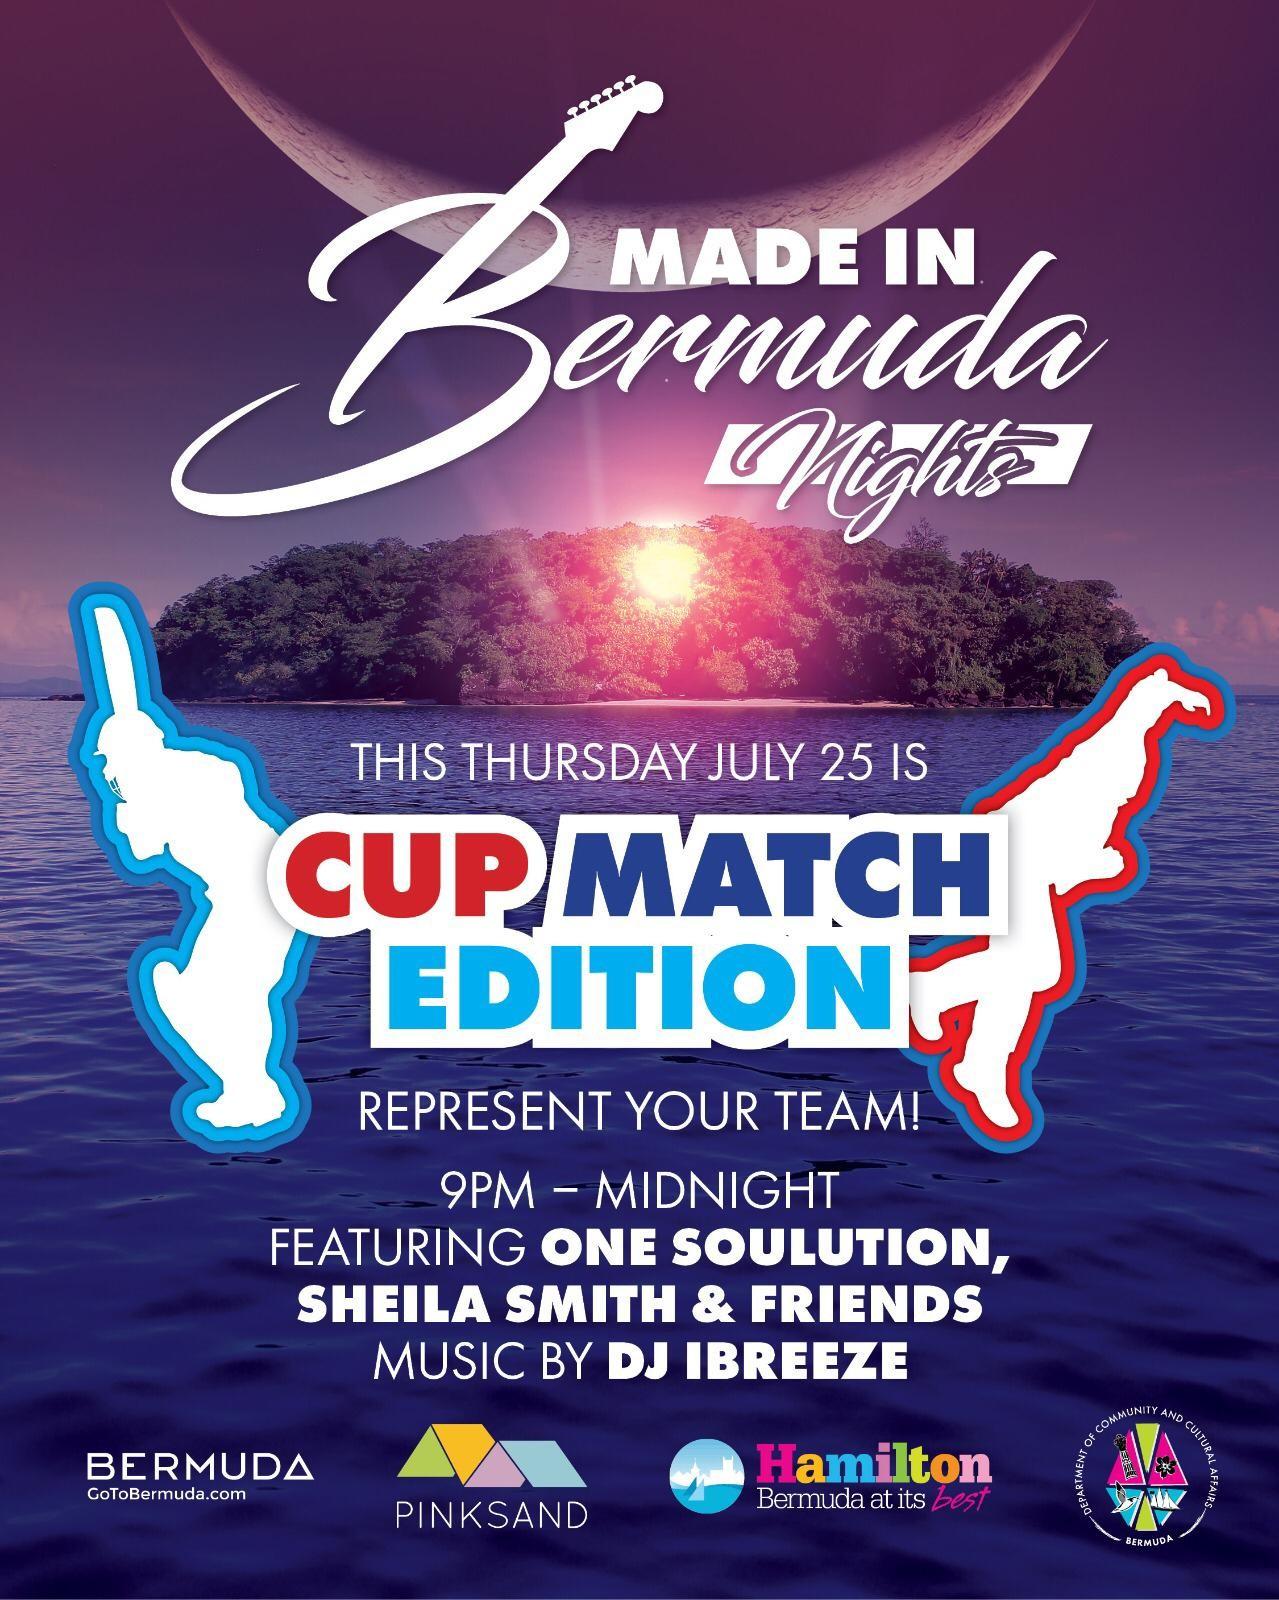 cup match